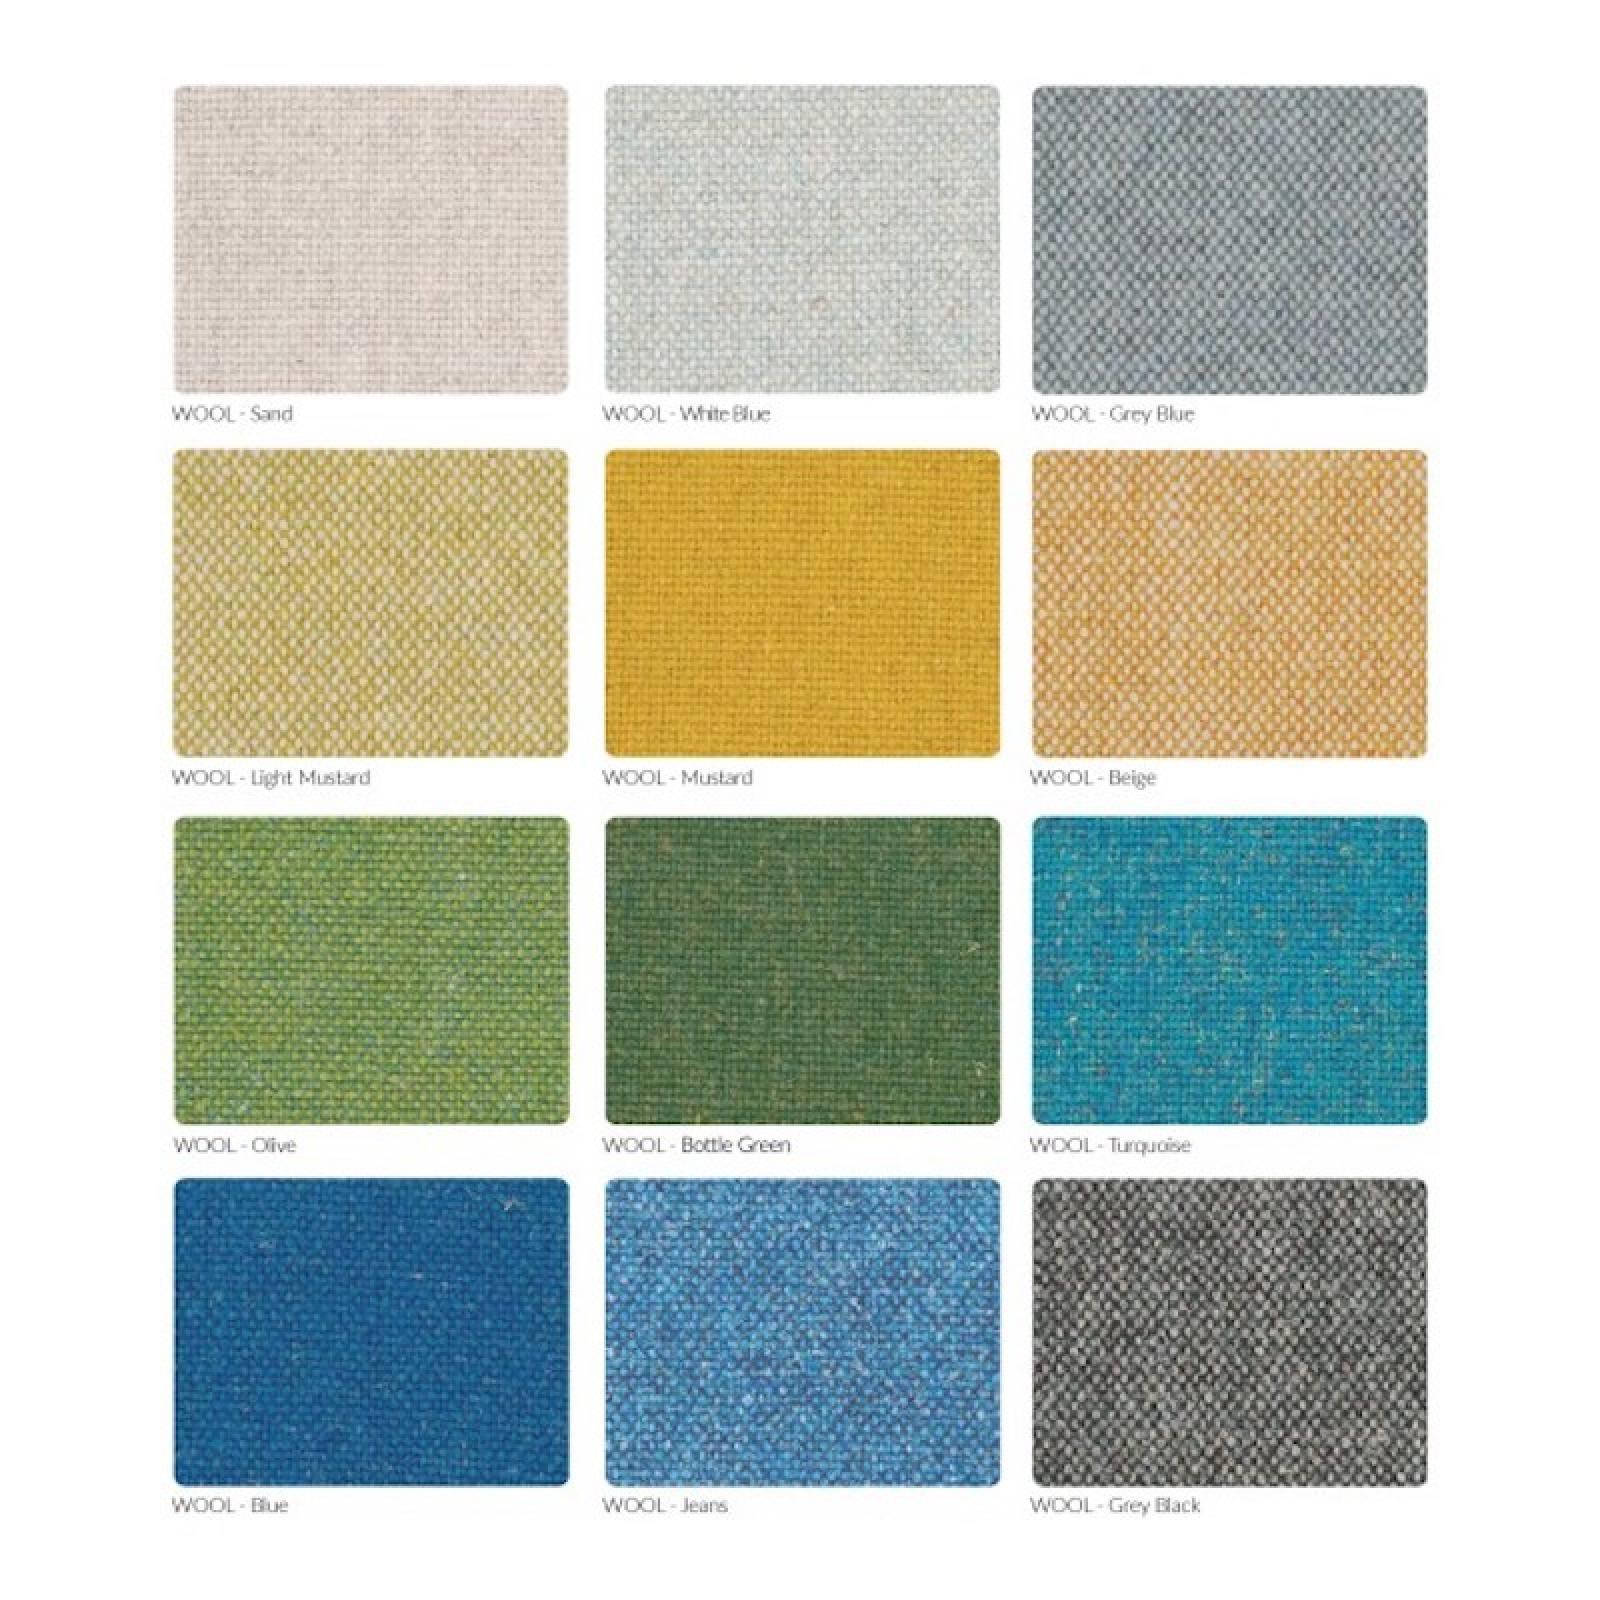 366 Armchair - Wool Fabrics thumbnails